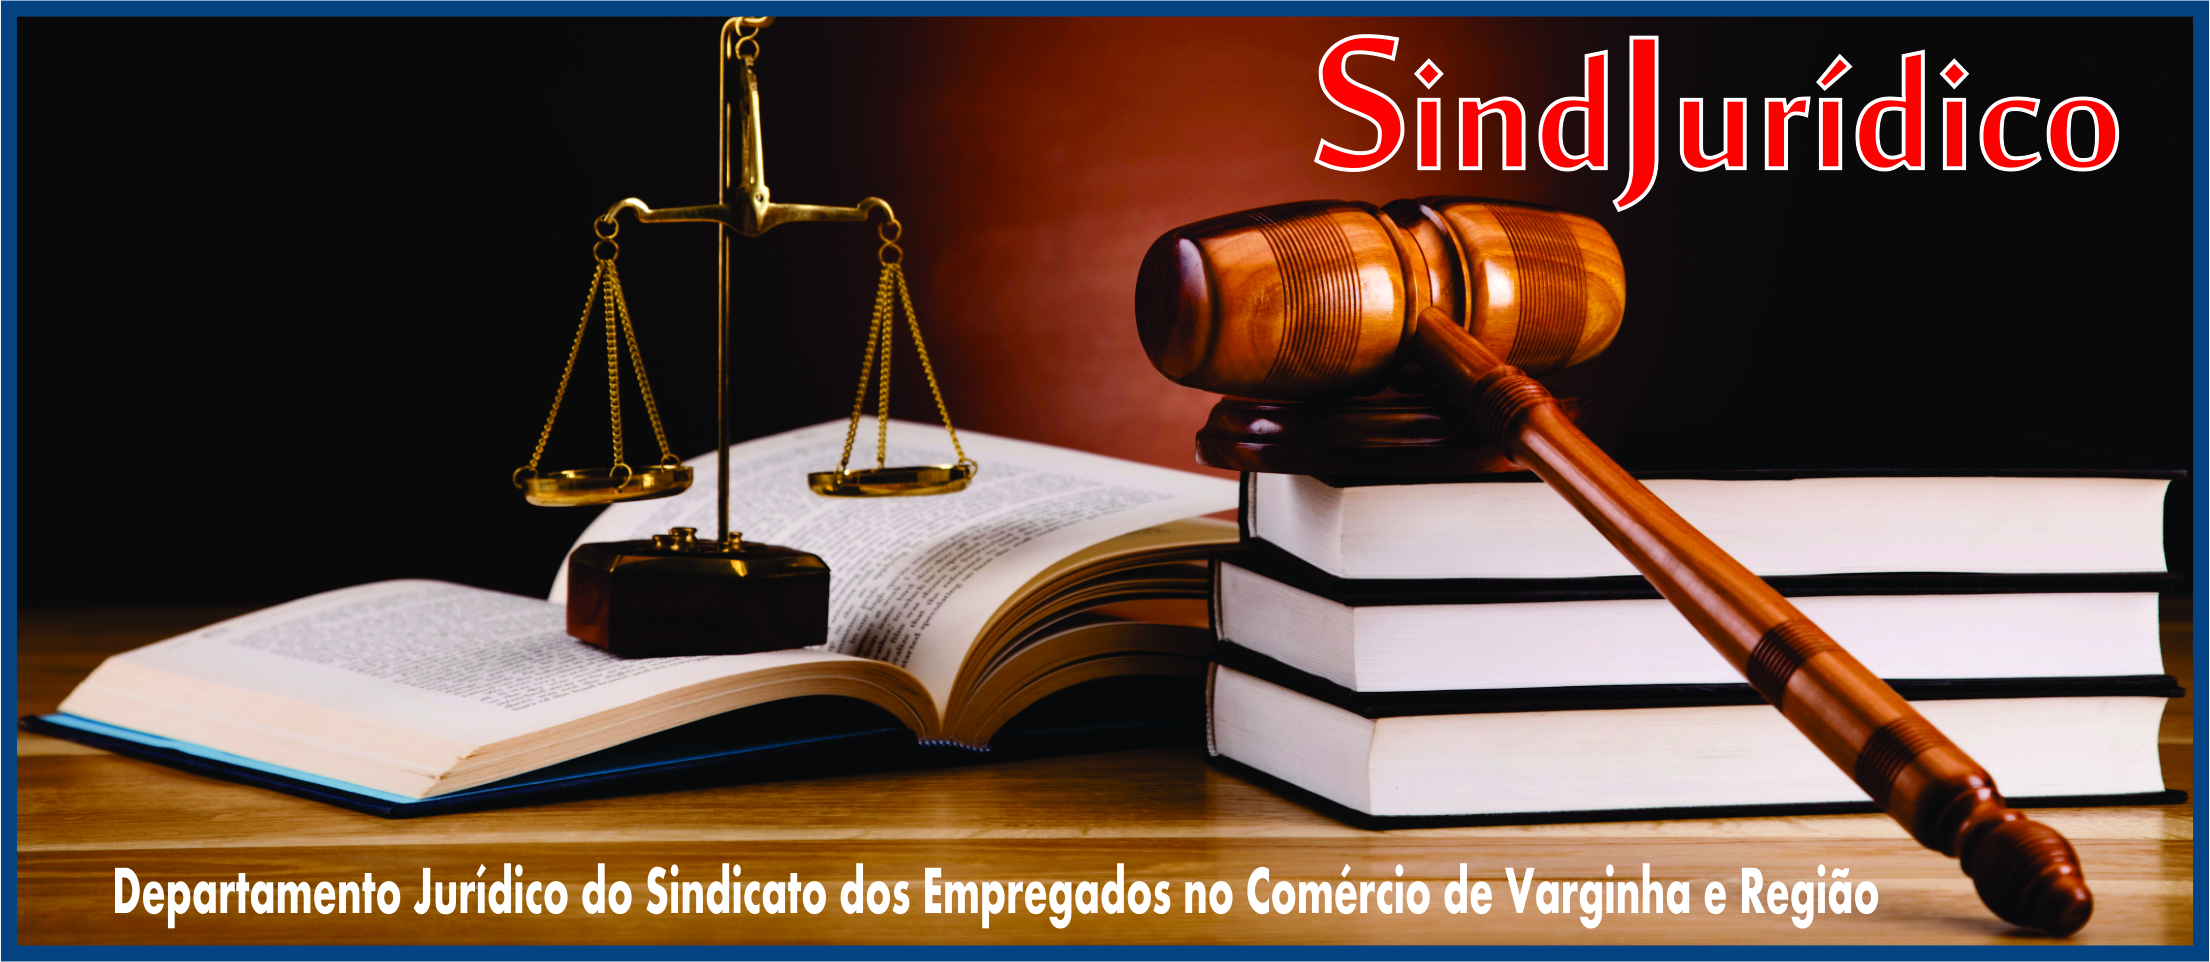 SindJurídico – Por dentro de seus direitos